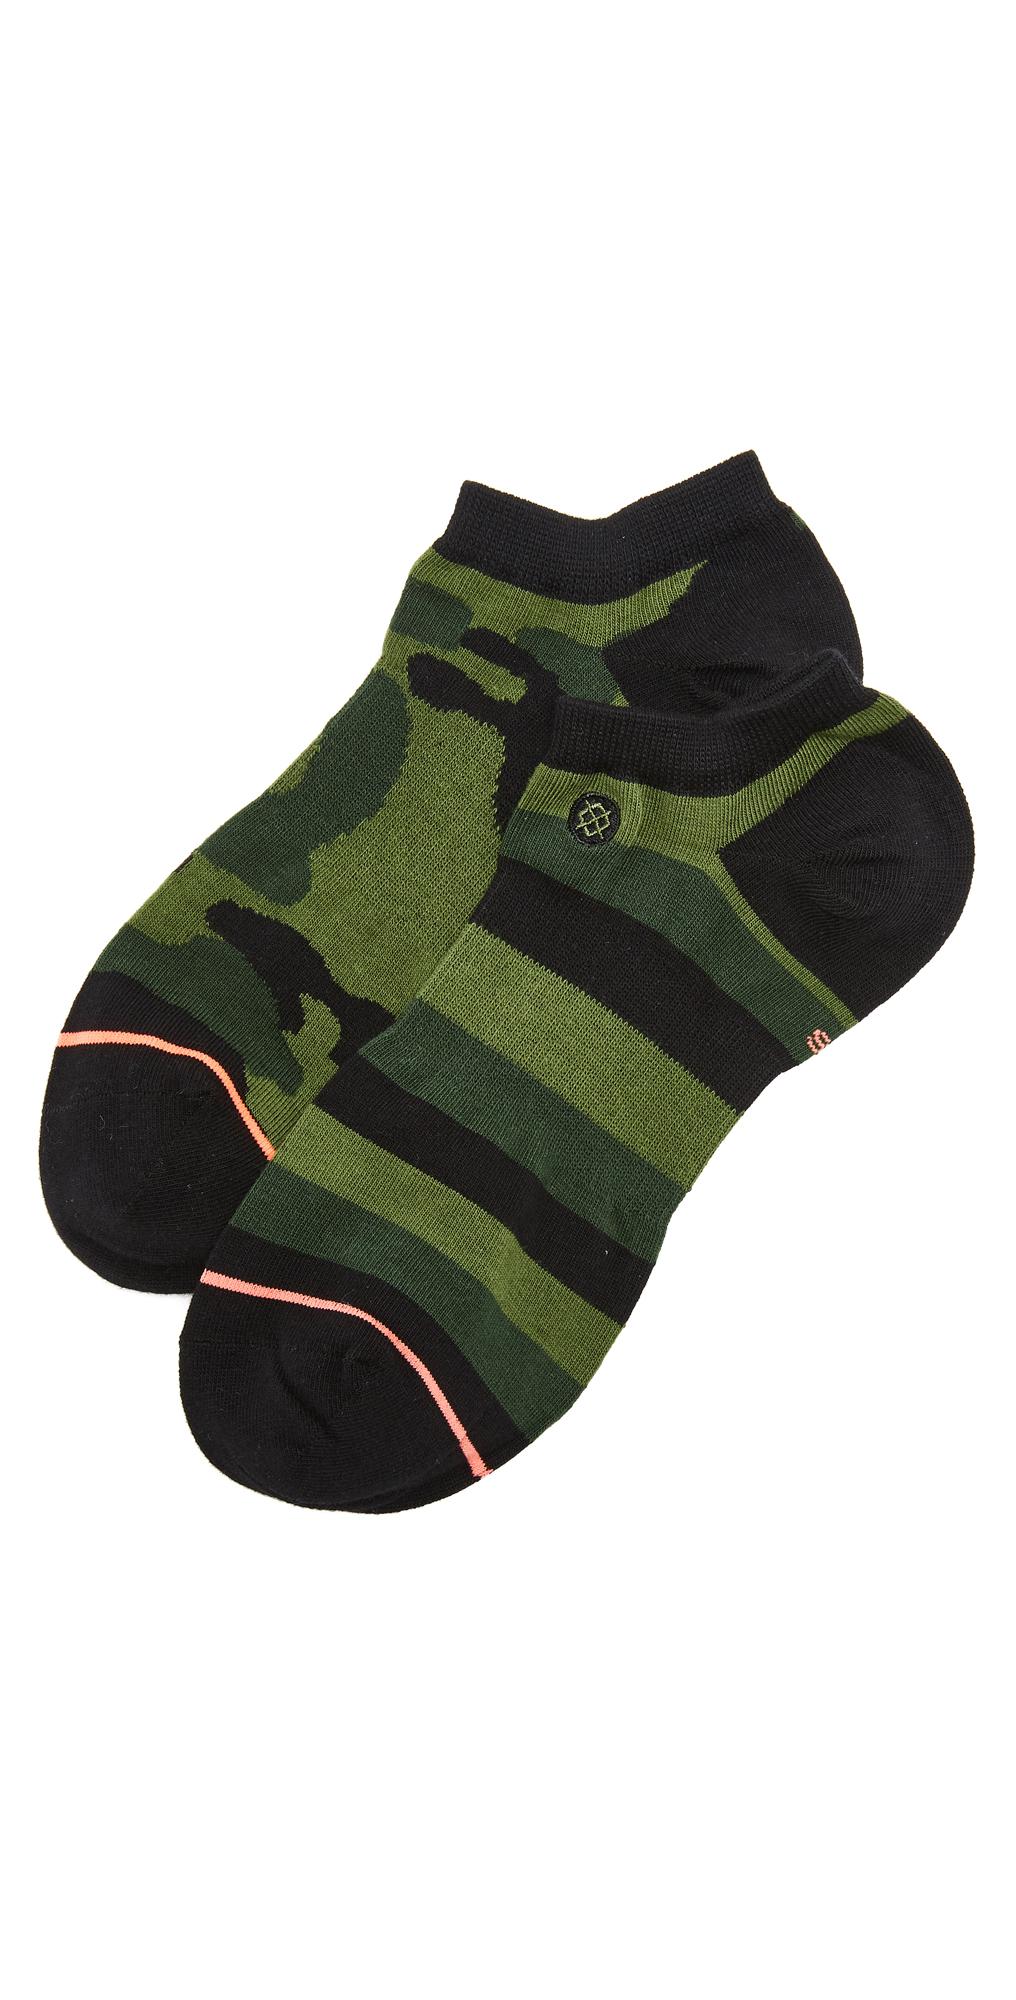 Lurk Socks STANCE